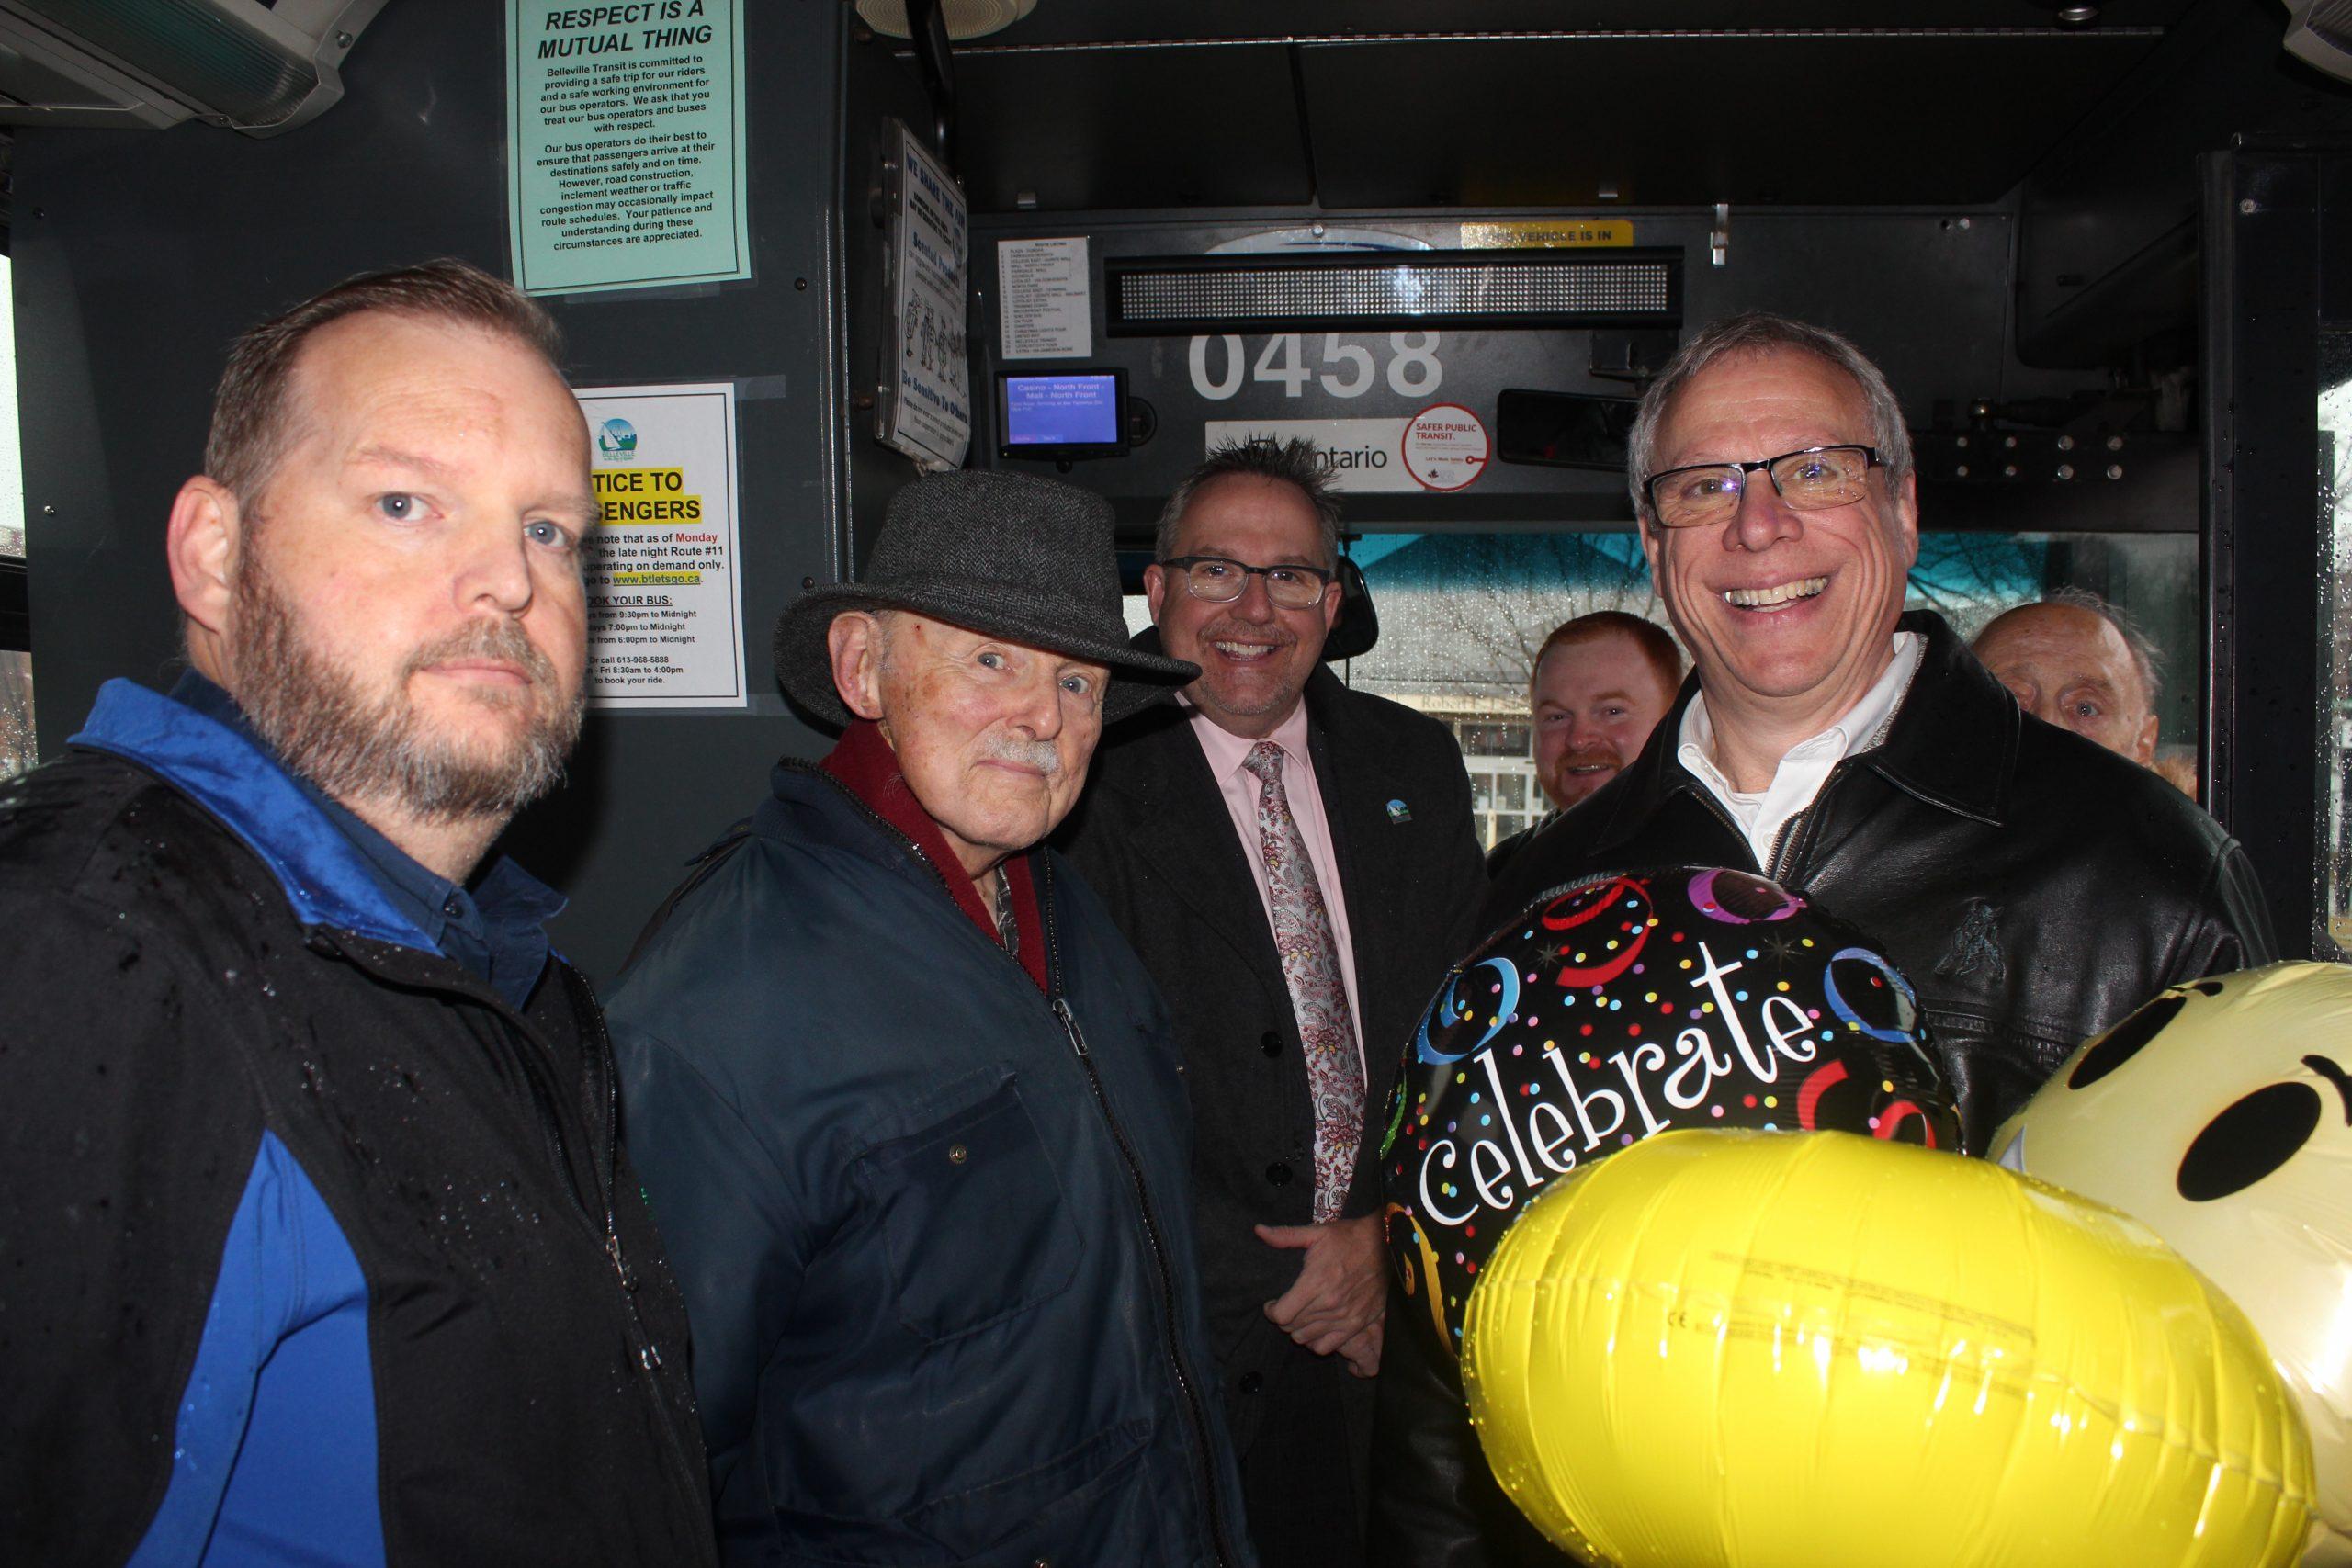 Belleville Transit welcomes one millionth rider